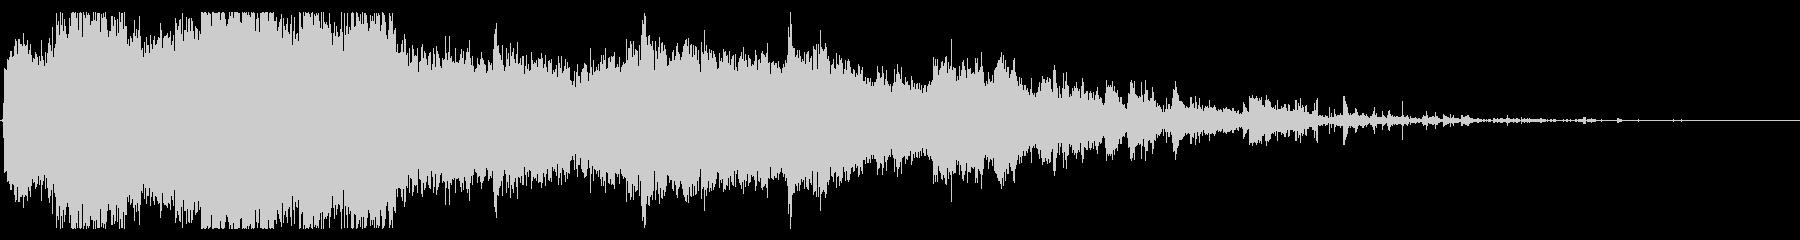 DEBRISによる大規模なクラッシ...の未再生の波形